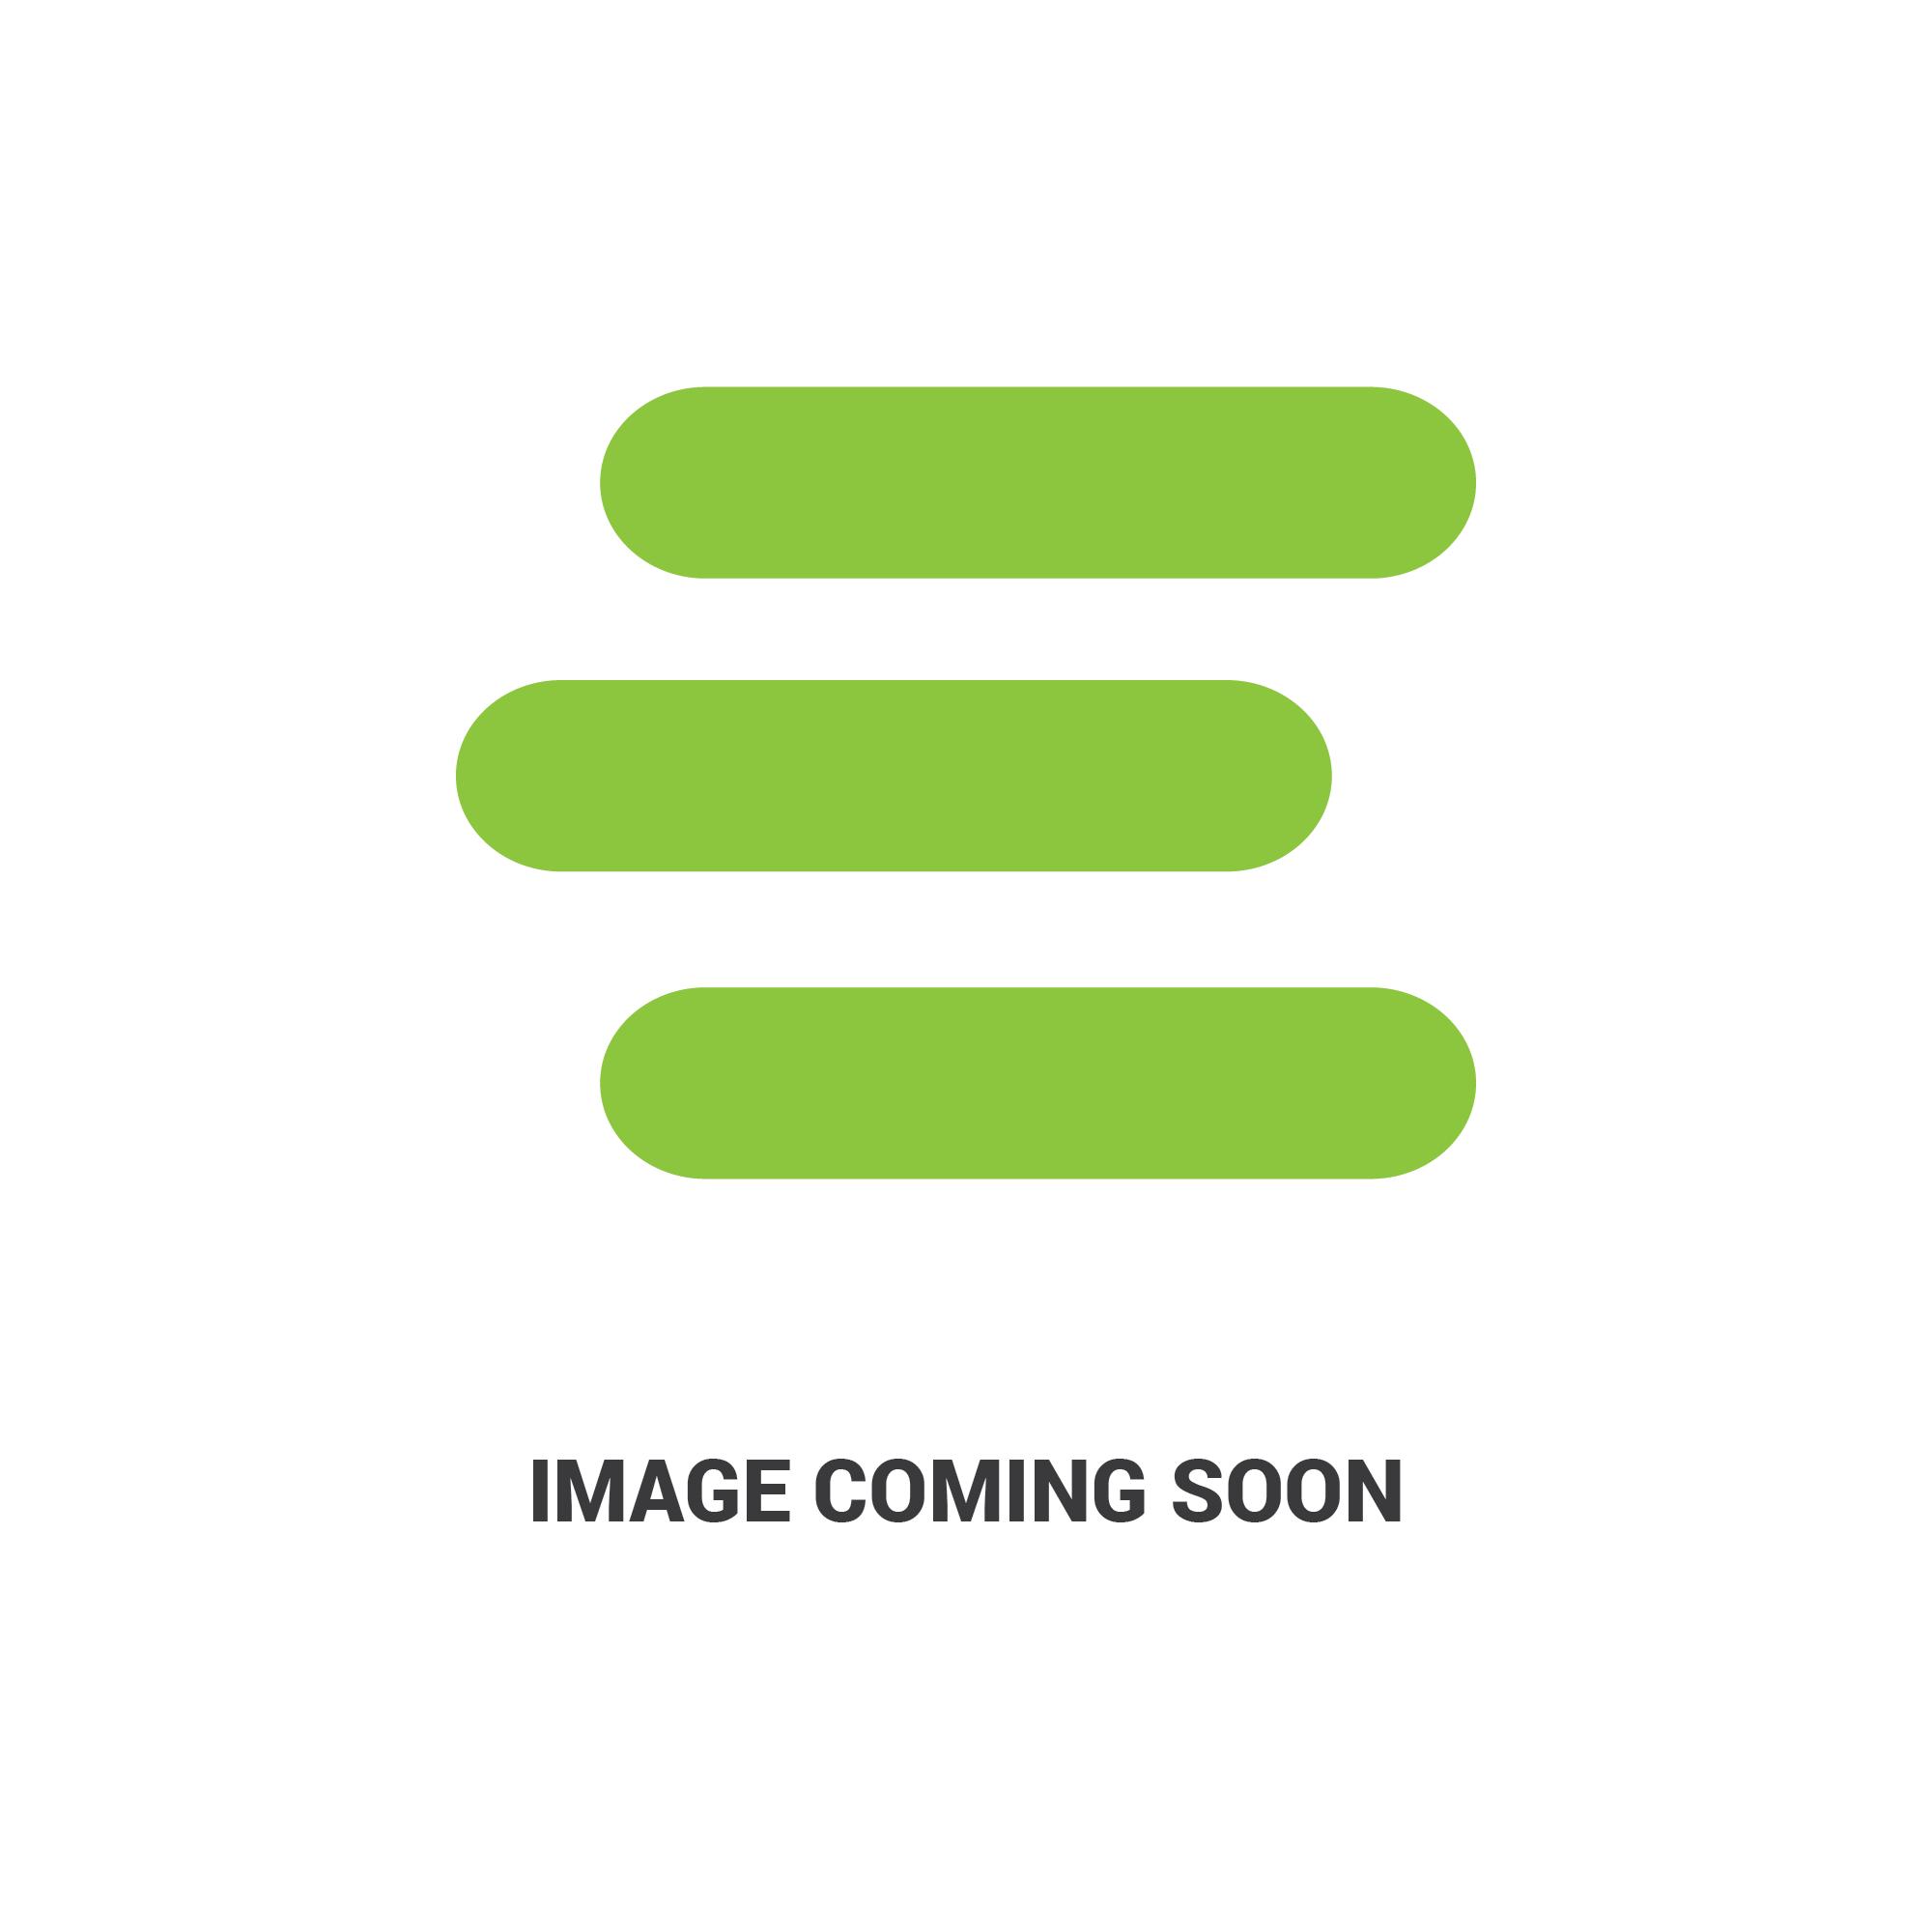 E-15221-43170edit 1.jpg